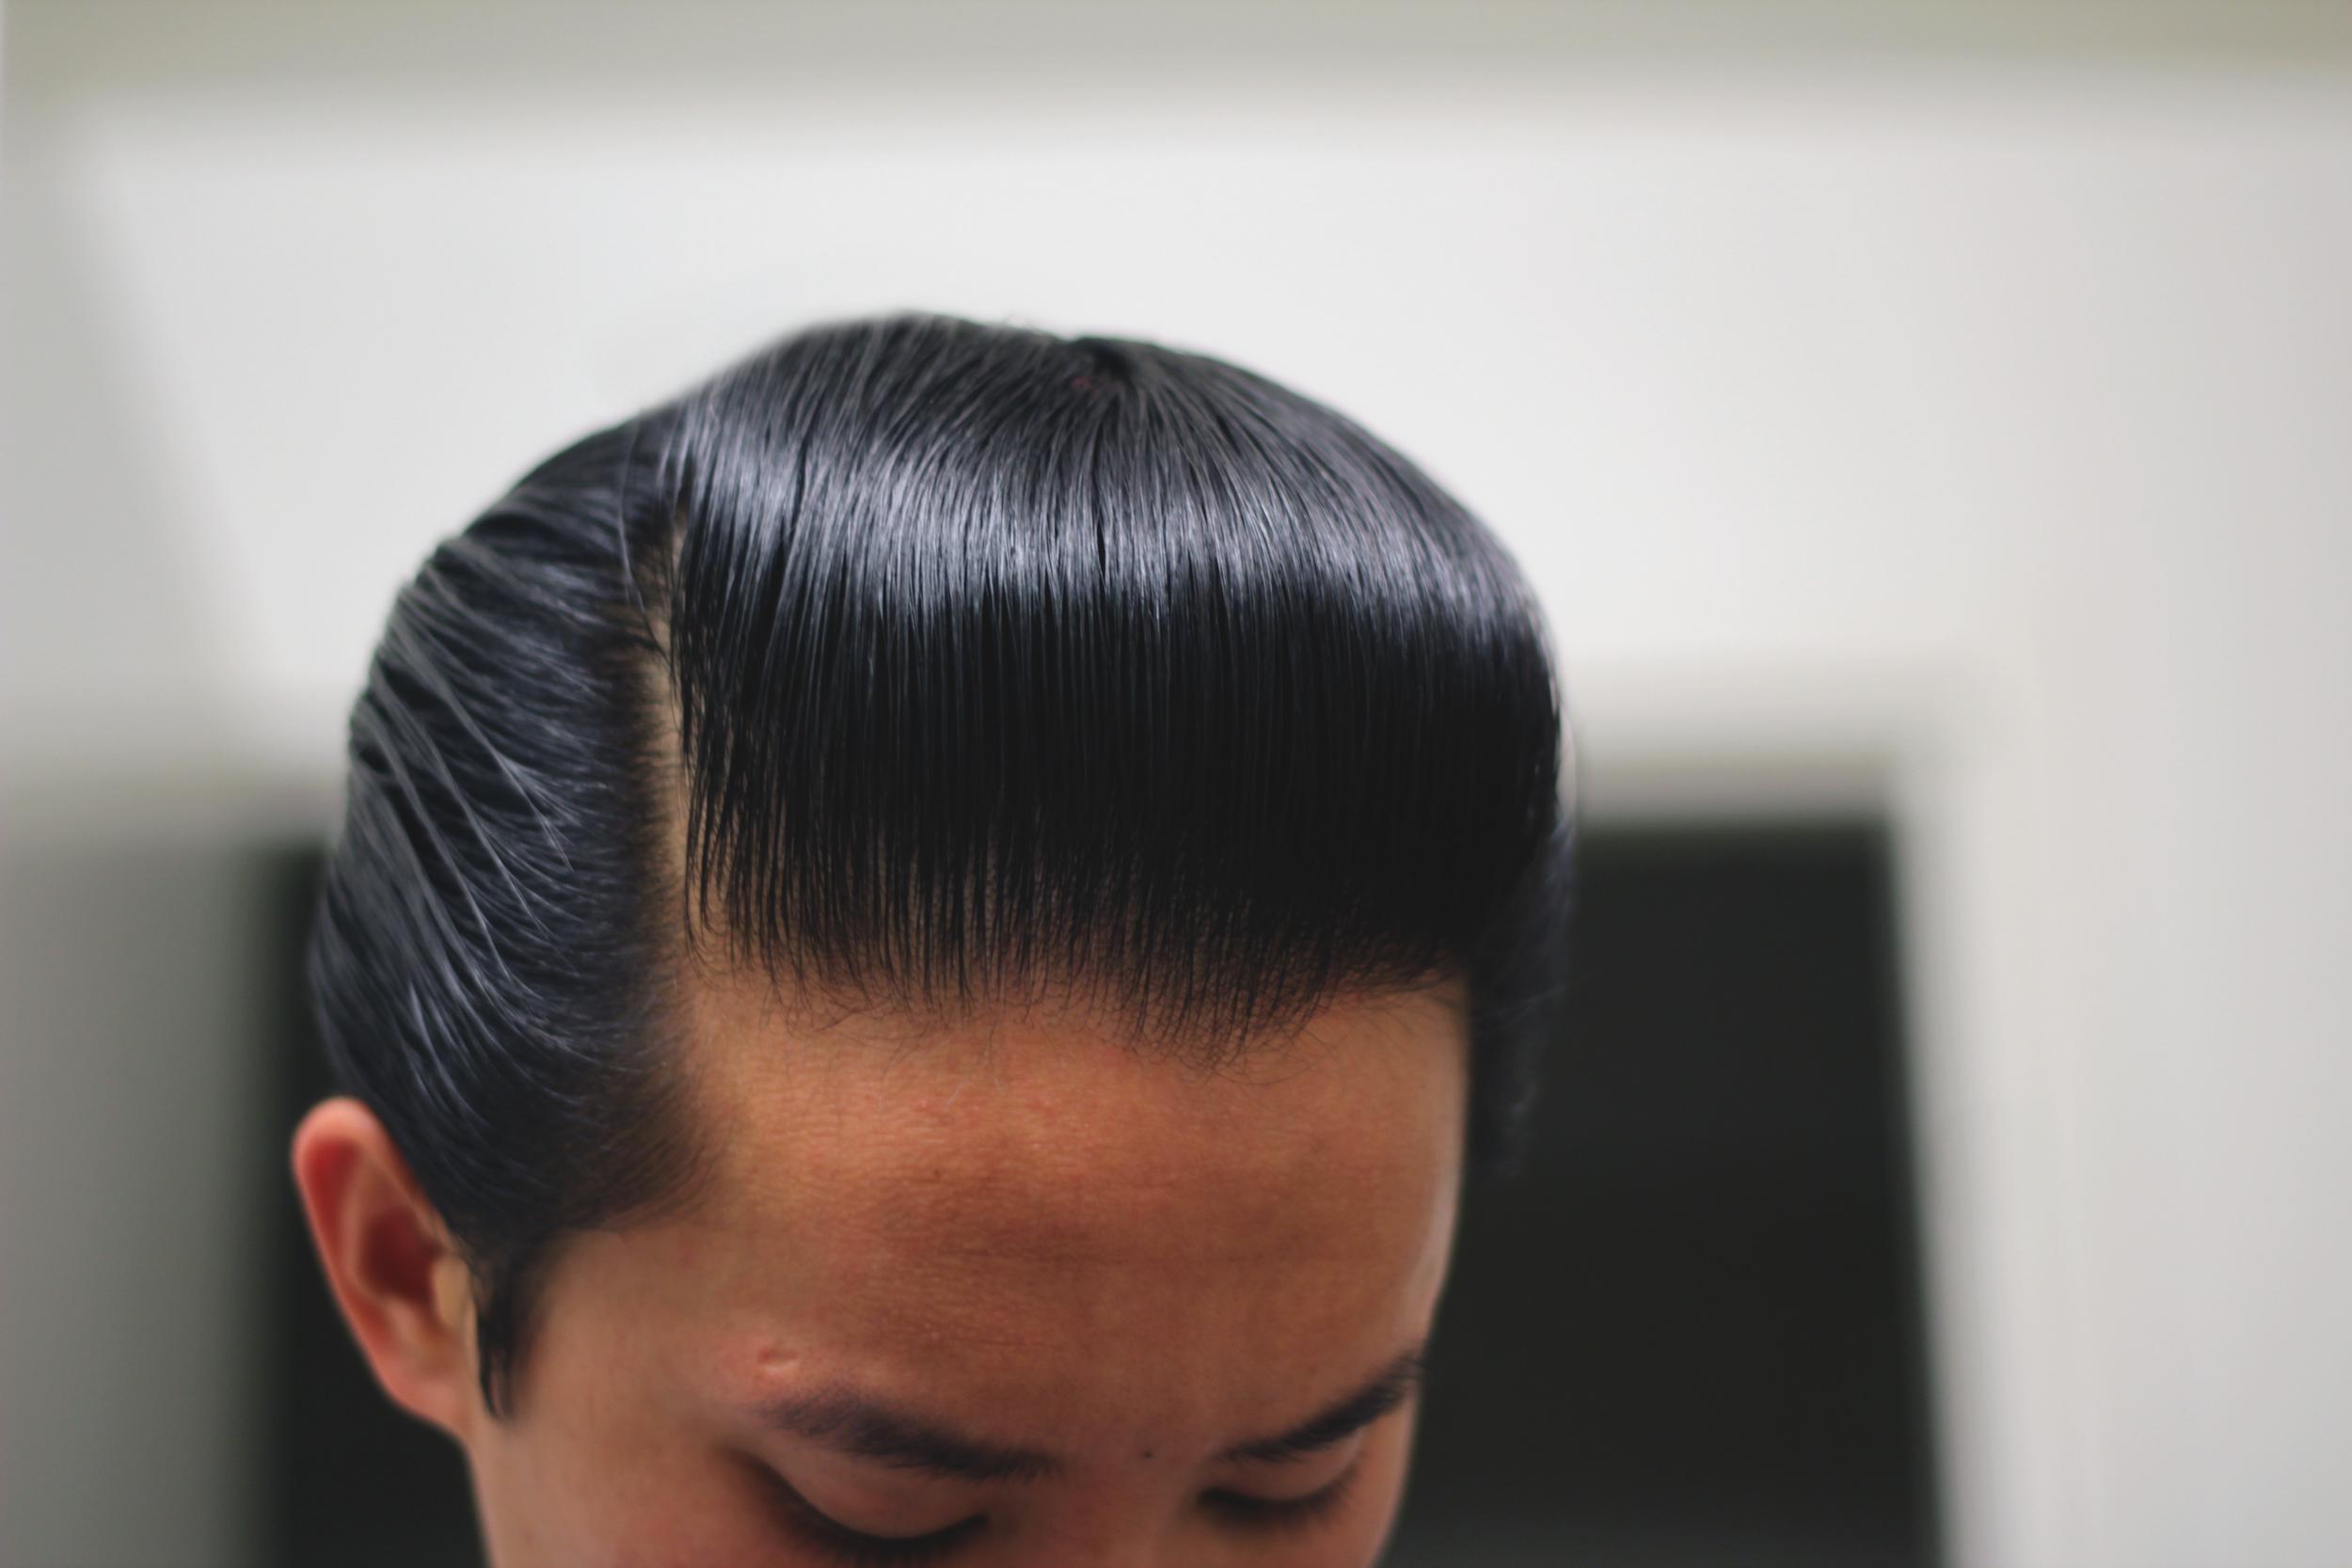 Taylor of Old Bond Street Hair Wax part